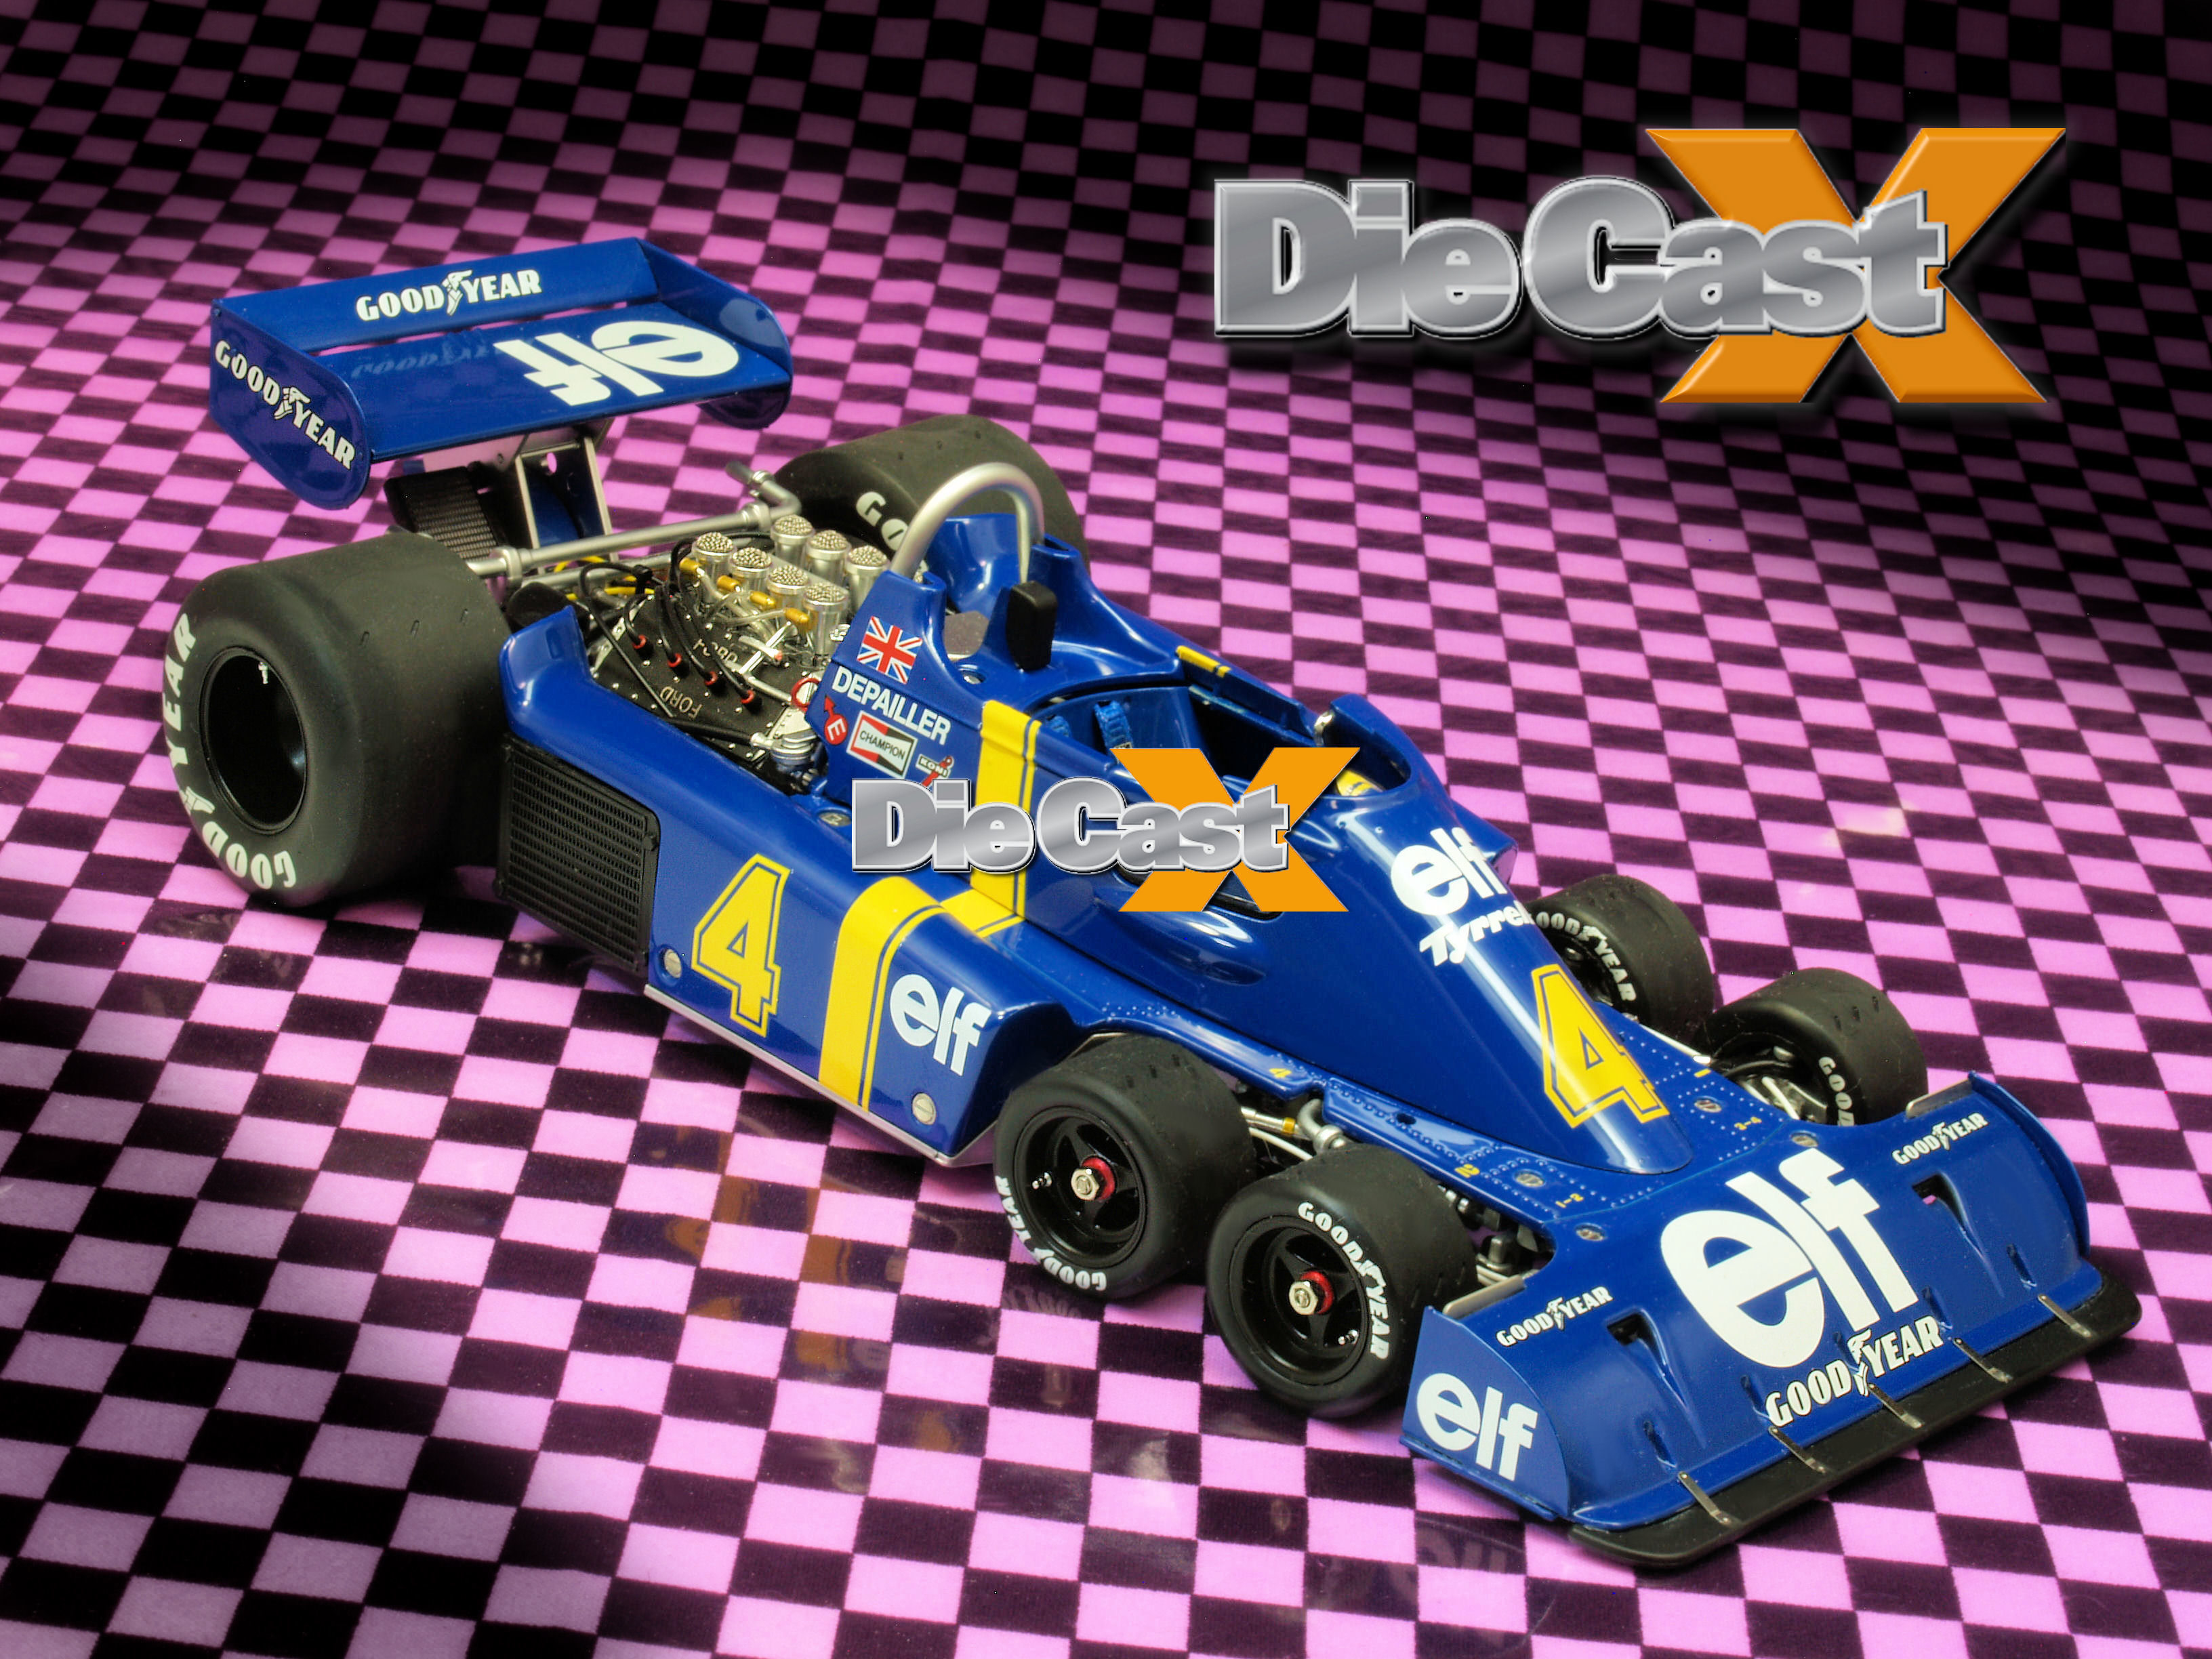 TrueScale Miniatures 1:18 Tyrrell P34s: The Odd Get Even